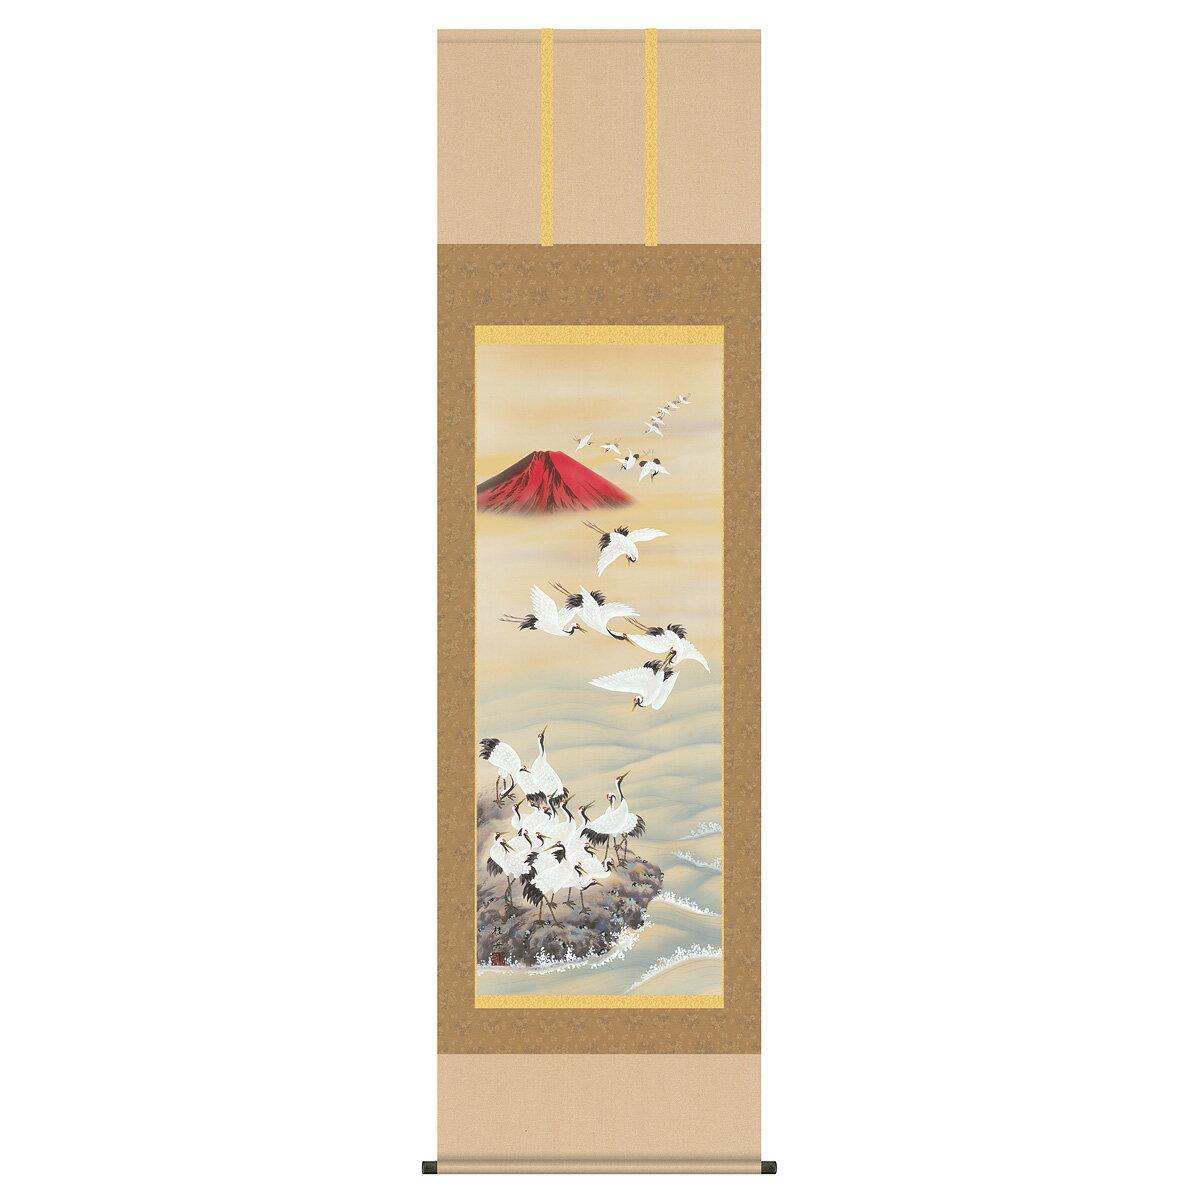 端午の節句 正月 掛け軸 掛軸 「長江桂舟(三美会)作 赤富士飛翔」 ●正月飾り 端午の節句